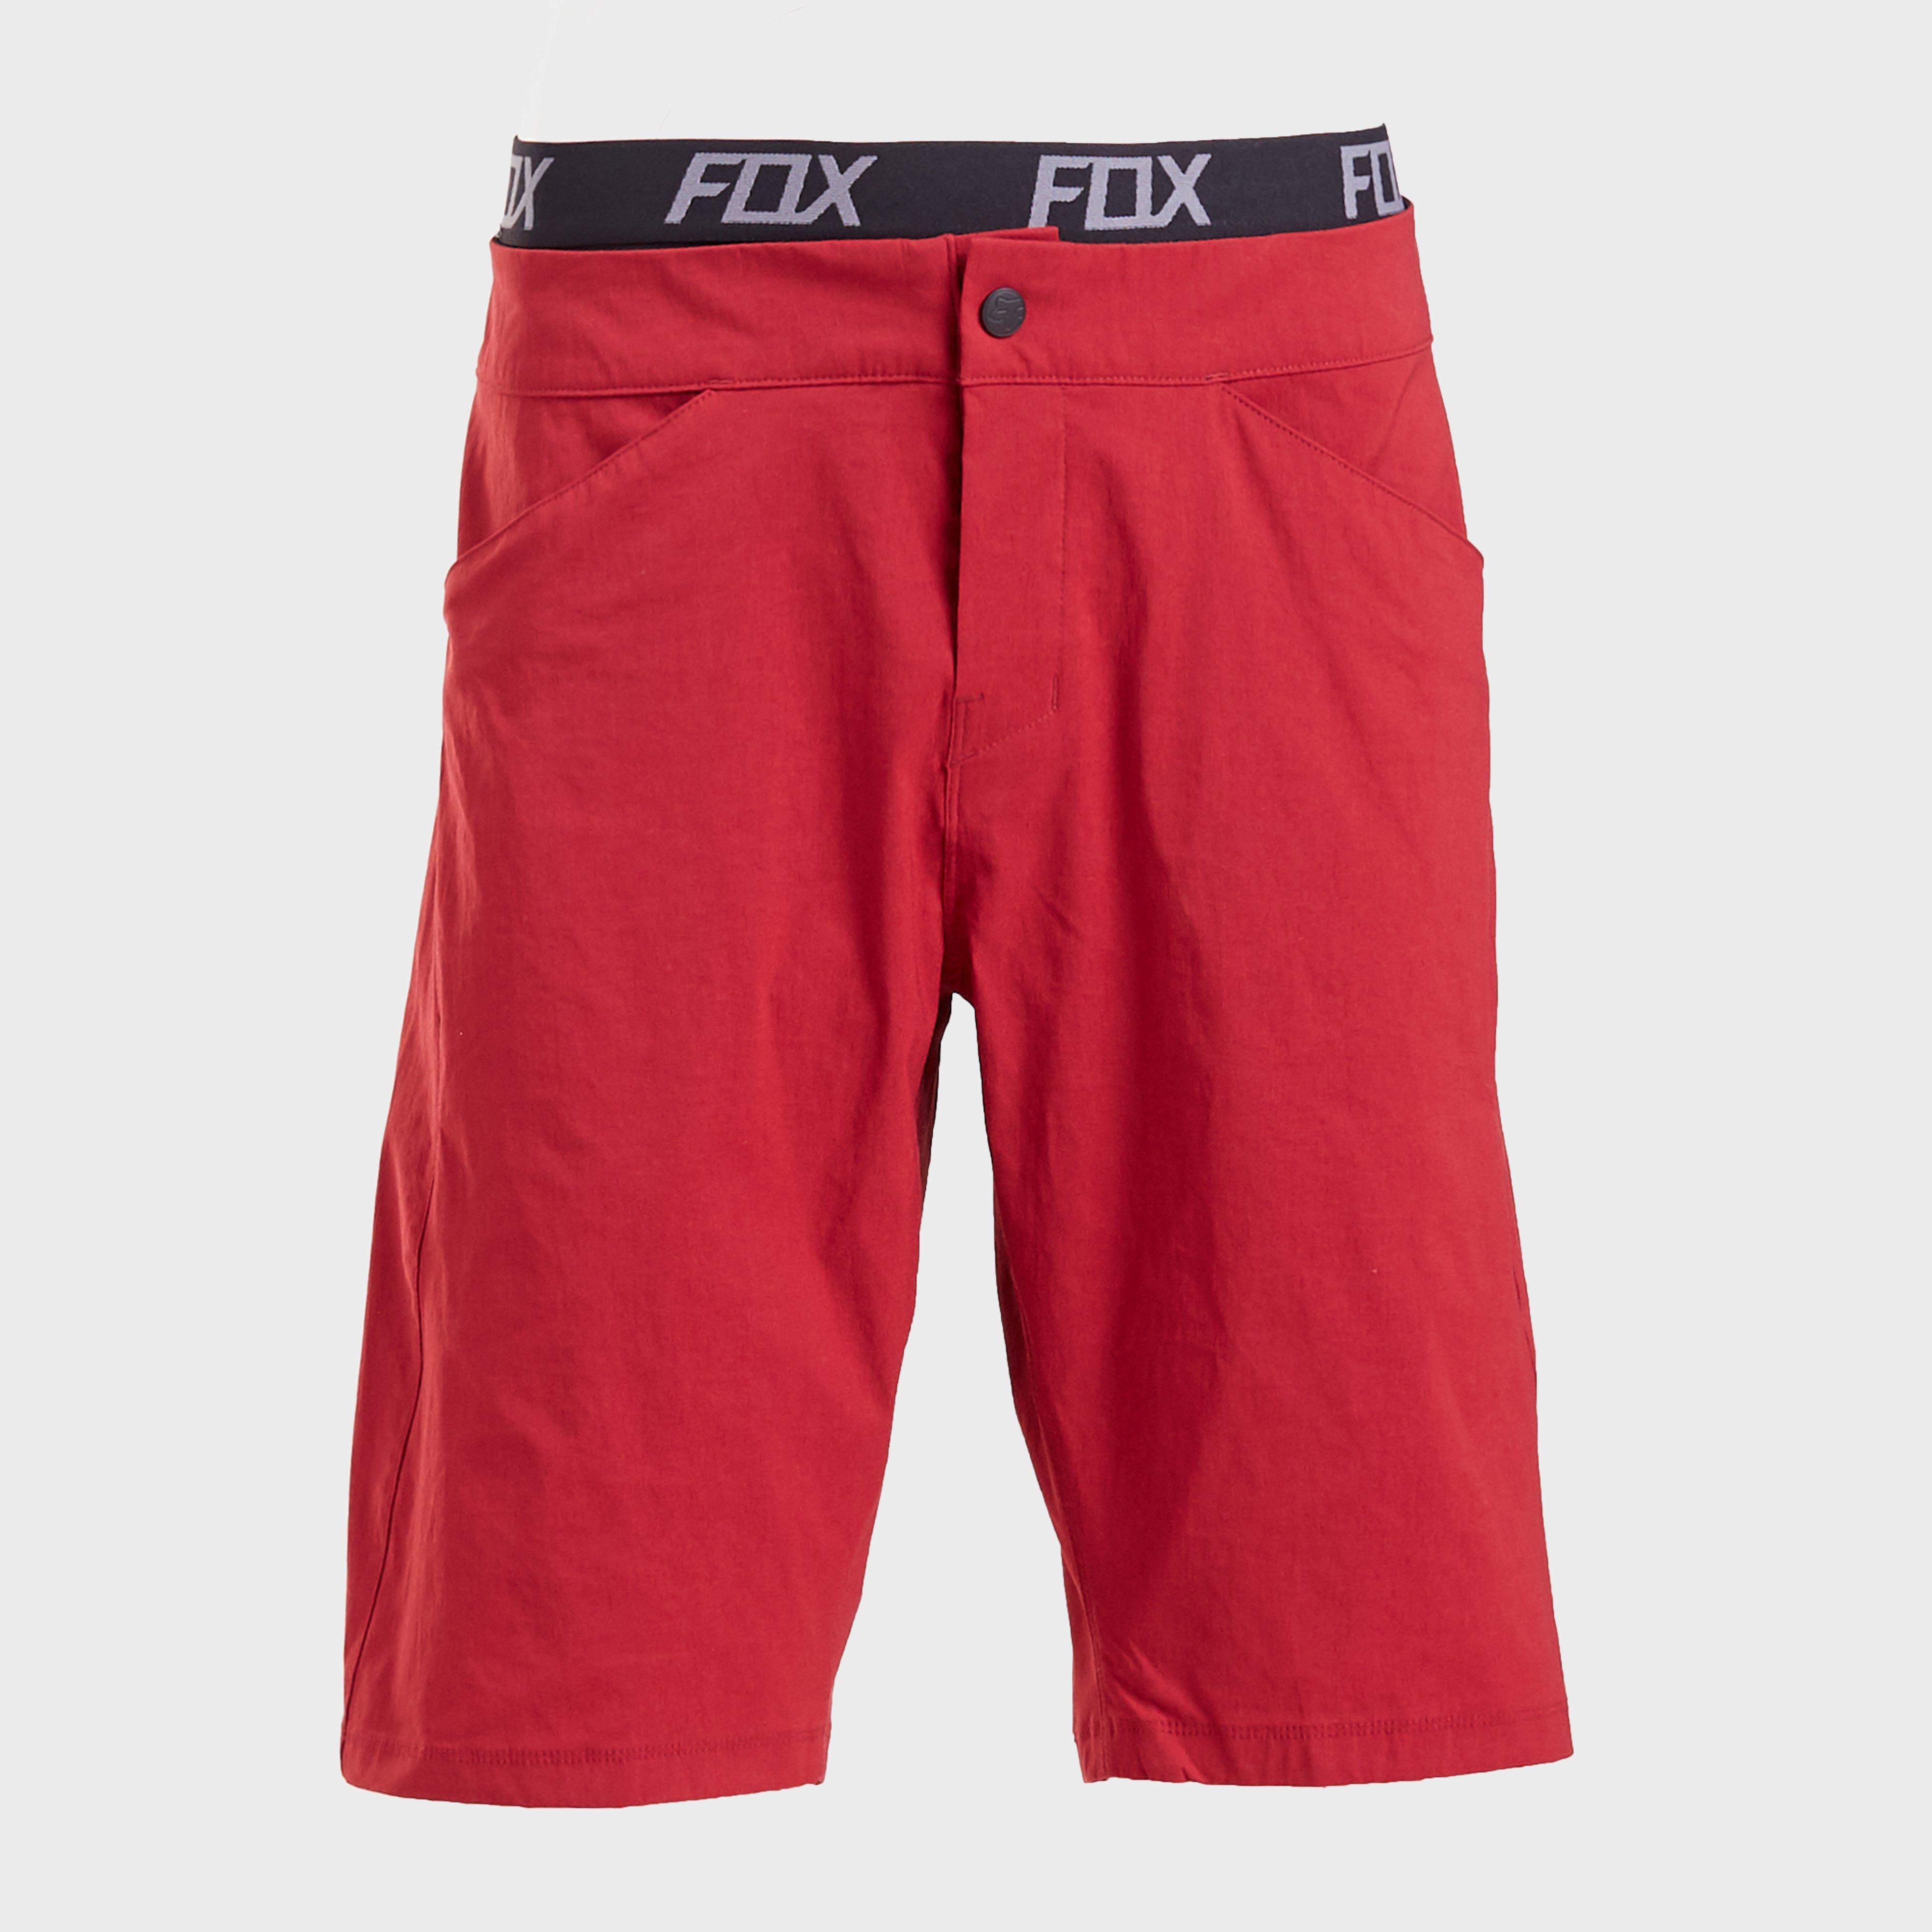 FOX Fox Mens Ranger Lite Shorts, Red